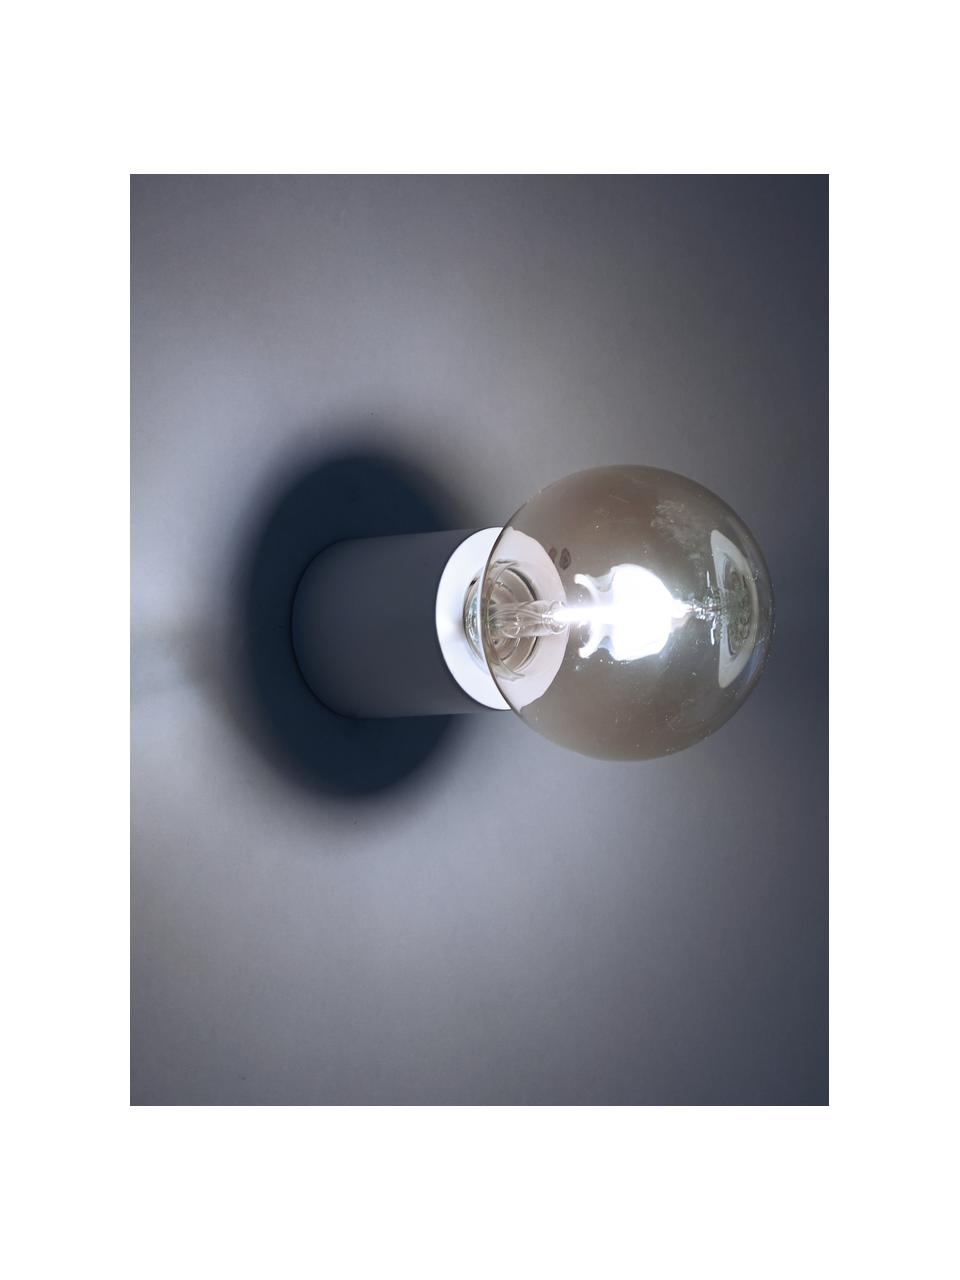 Applique da parete o soffitto Chanty, Lampada: metallo verniciato a polv, Bianco opaco, Ø 6 x Prof. 7 cm